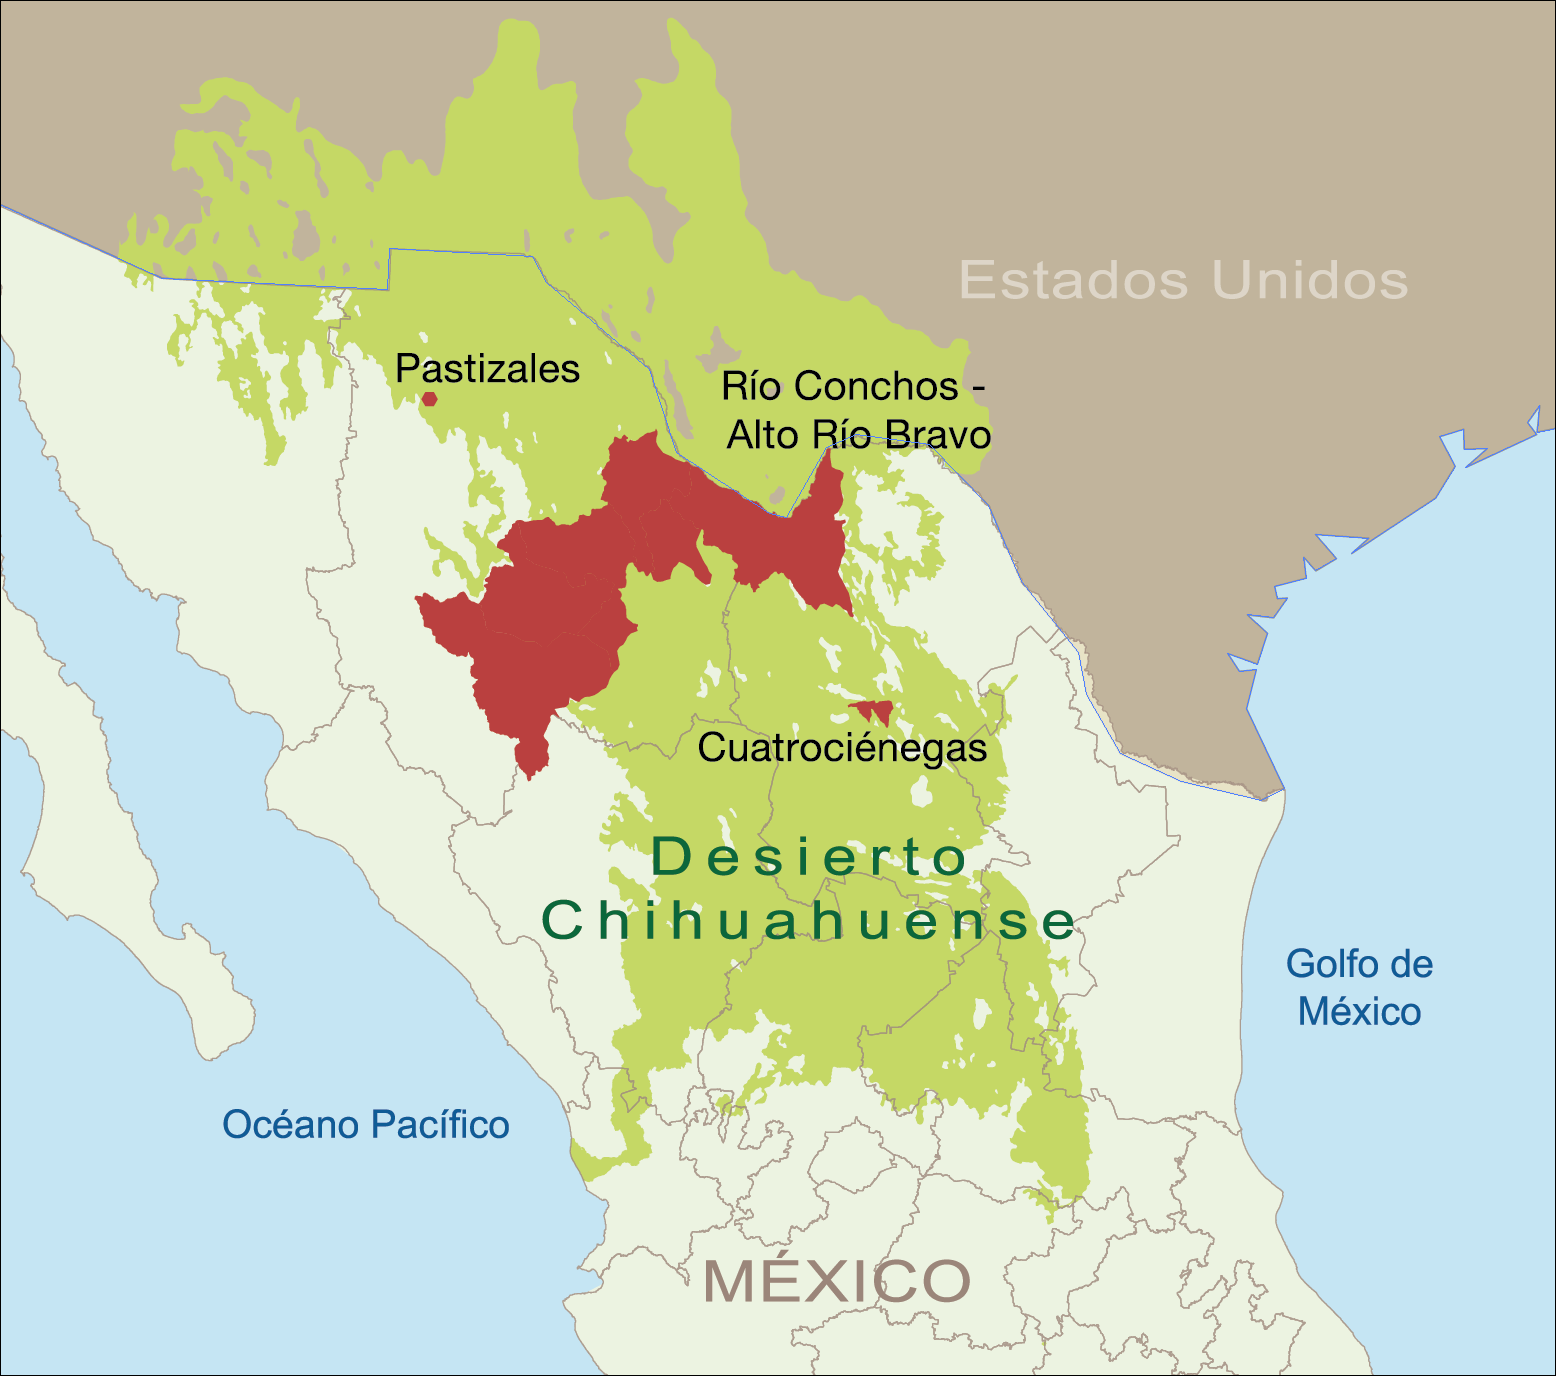 Mapa Desierto Chihuahuense, áreas de trabajo de WWF México